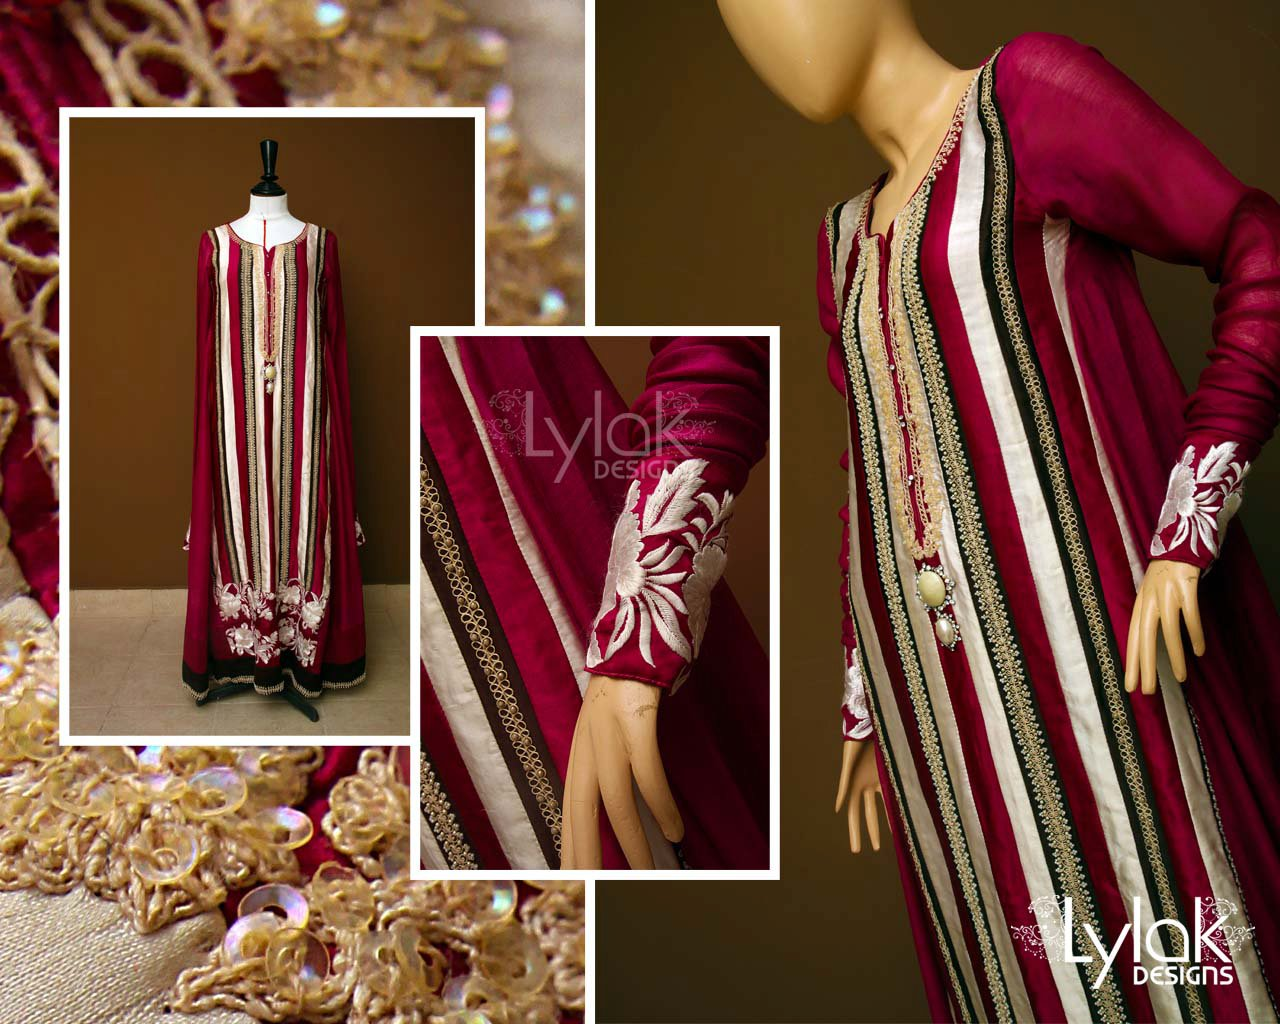 Formal Wear Collection at Lylak Designs 010